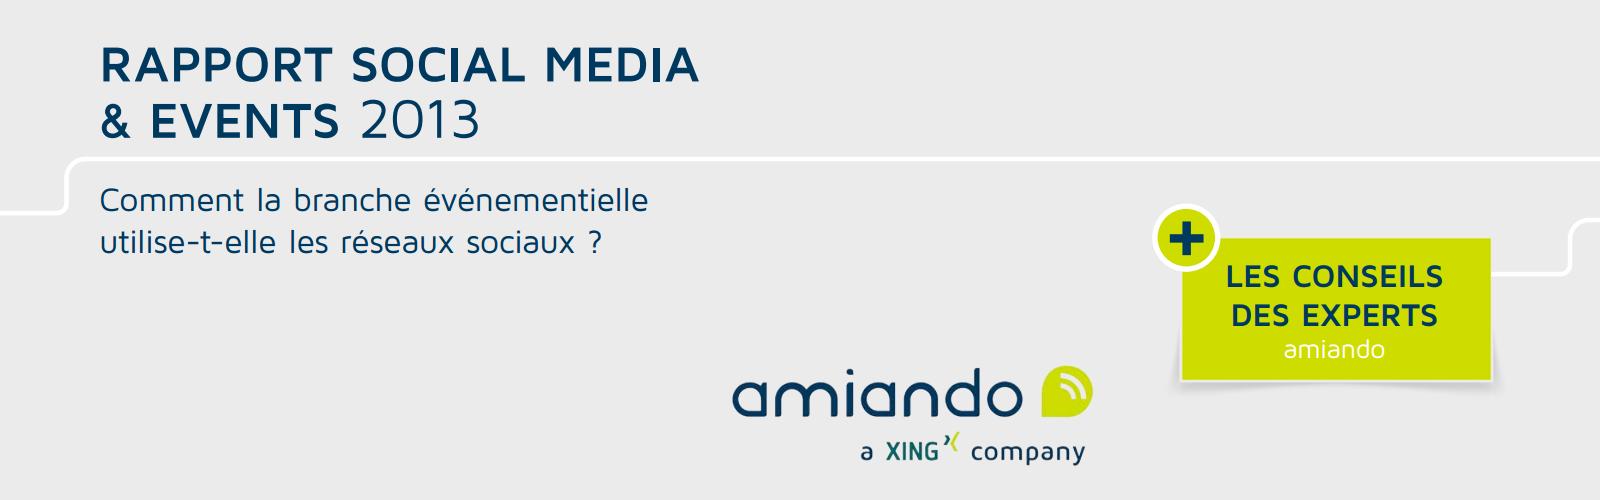 social-media-rapport-amiando-2013